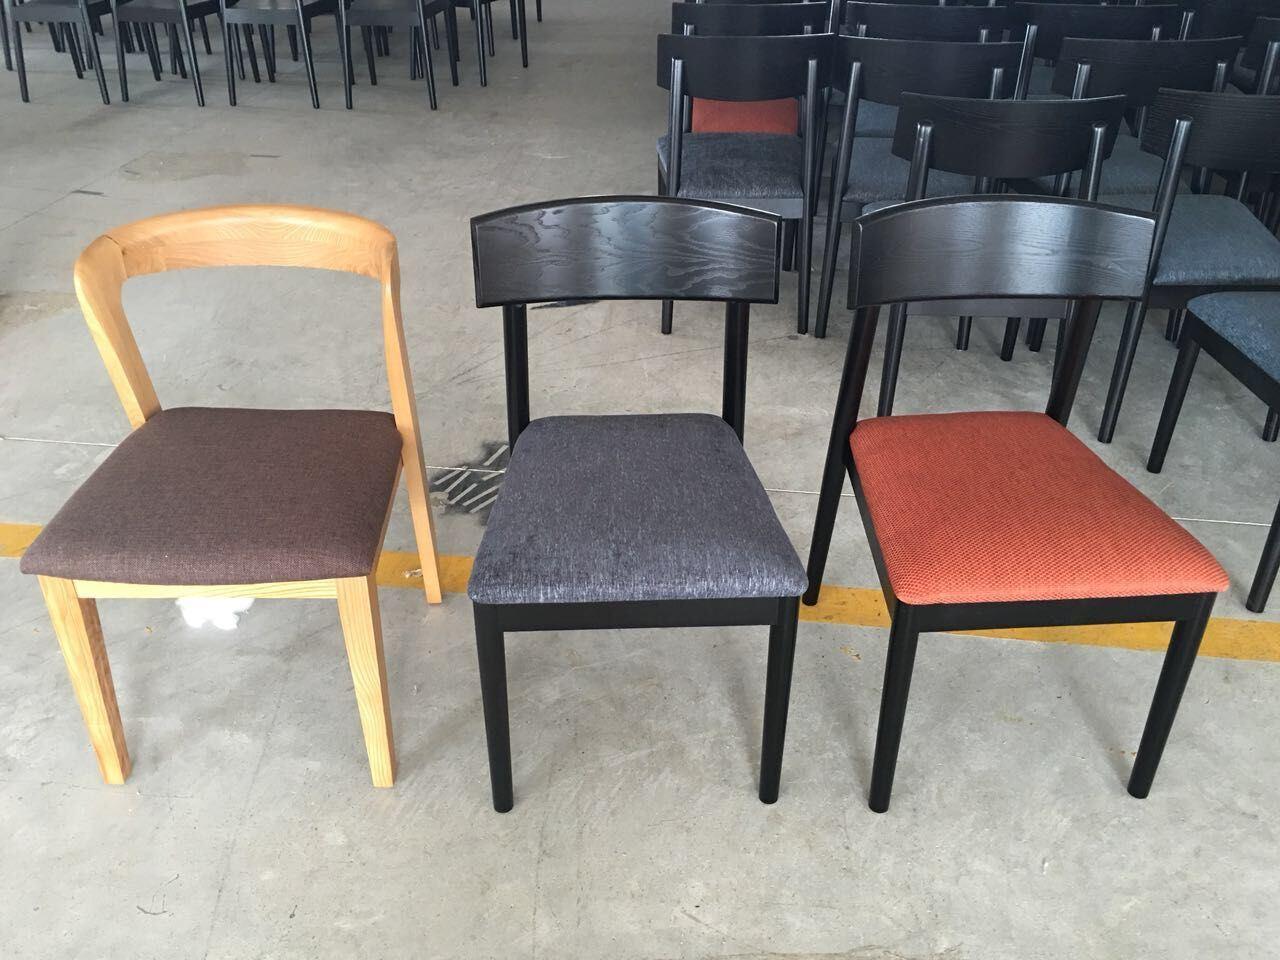 Restaurant Furniture/Hotel Furniture/Restaurant Chair/Dining Furniture Sets/Restaurant Furniture Sets/Solid Wood Chair (GLSC-00070)